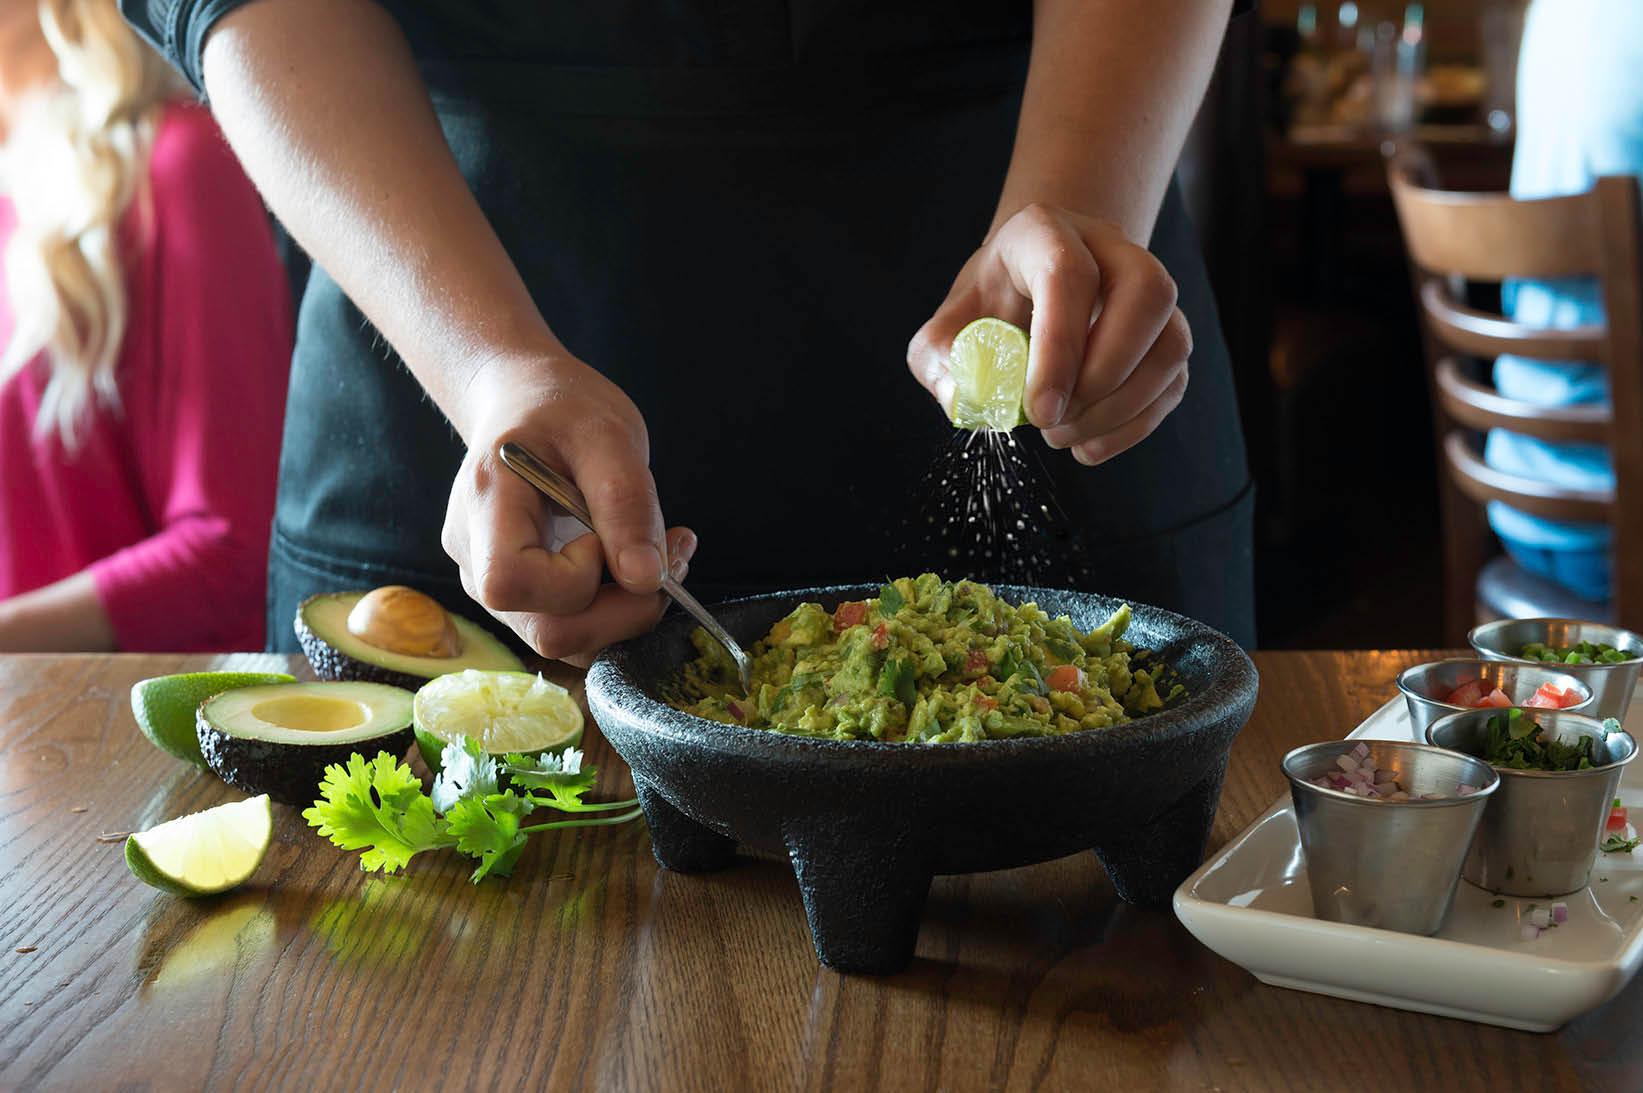 catering cheap catering catering menu catering mexican catering service authentic mexican catering mexican catering near me mexican food catering taco caterer taco catering taco bar catering